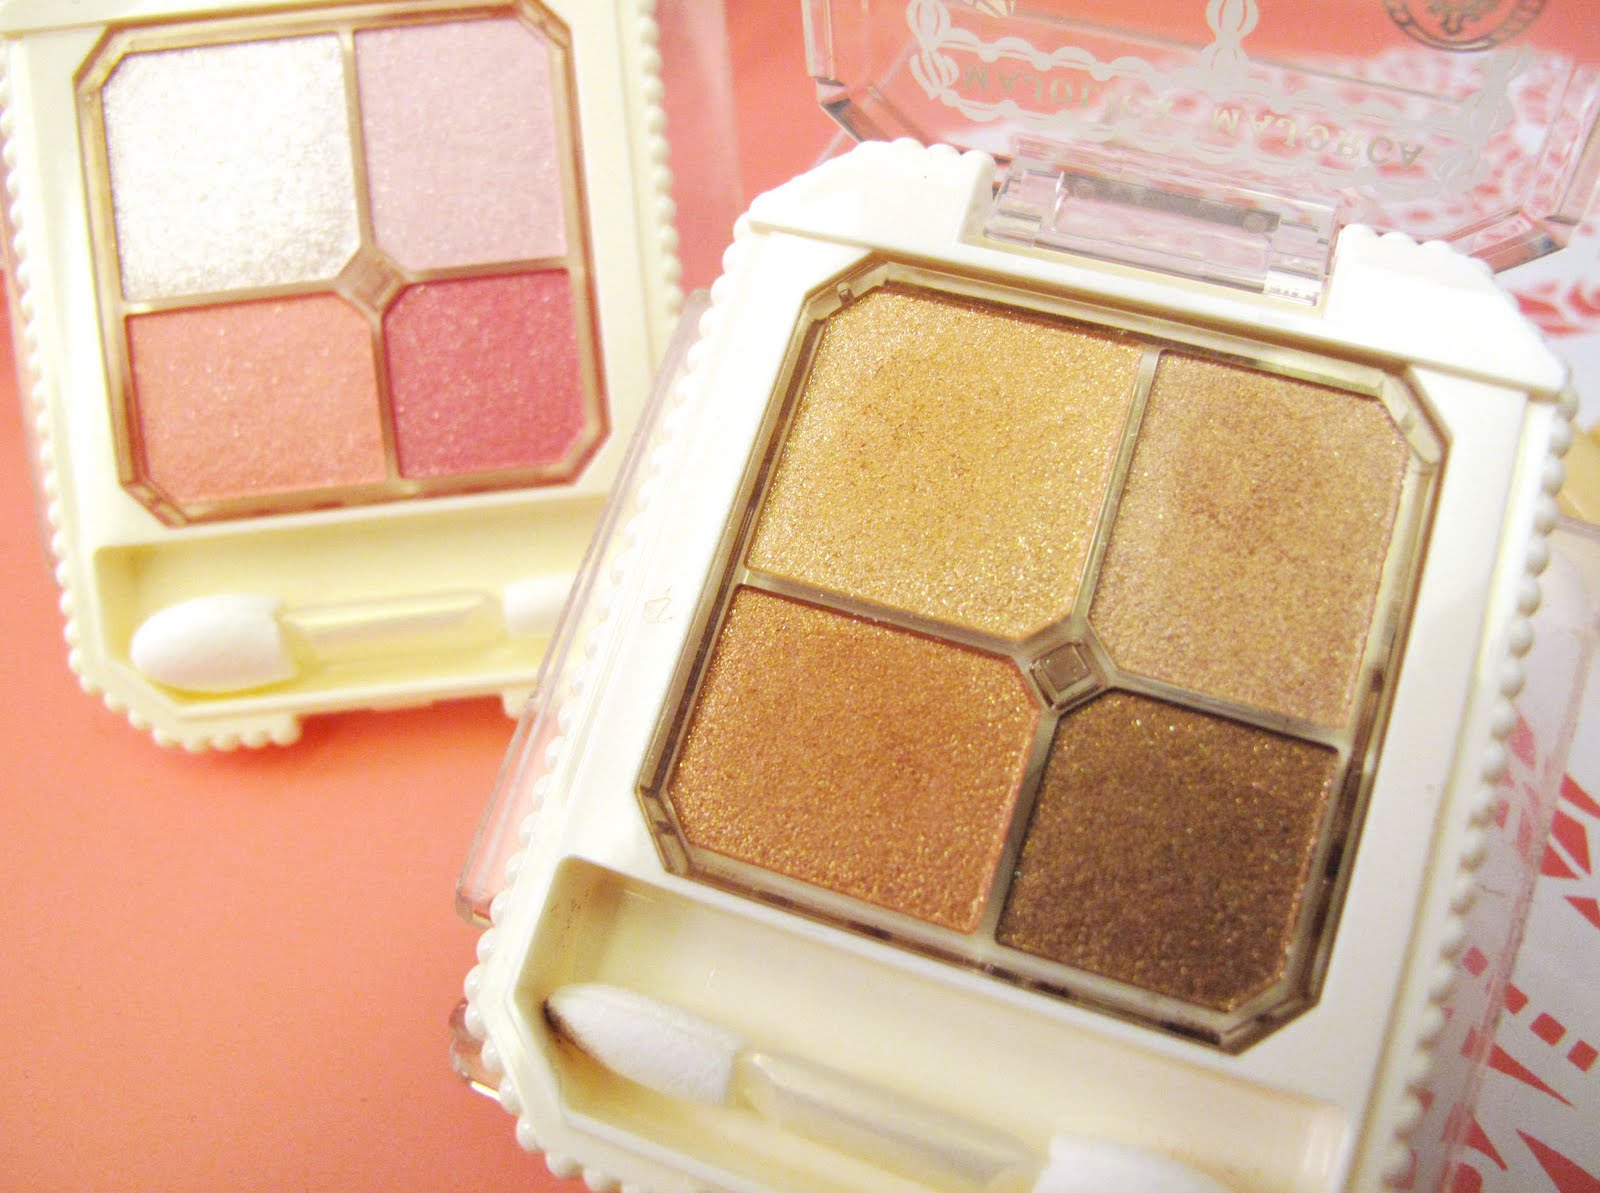 Majolica Majorca shiseido macaroon 胭脂